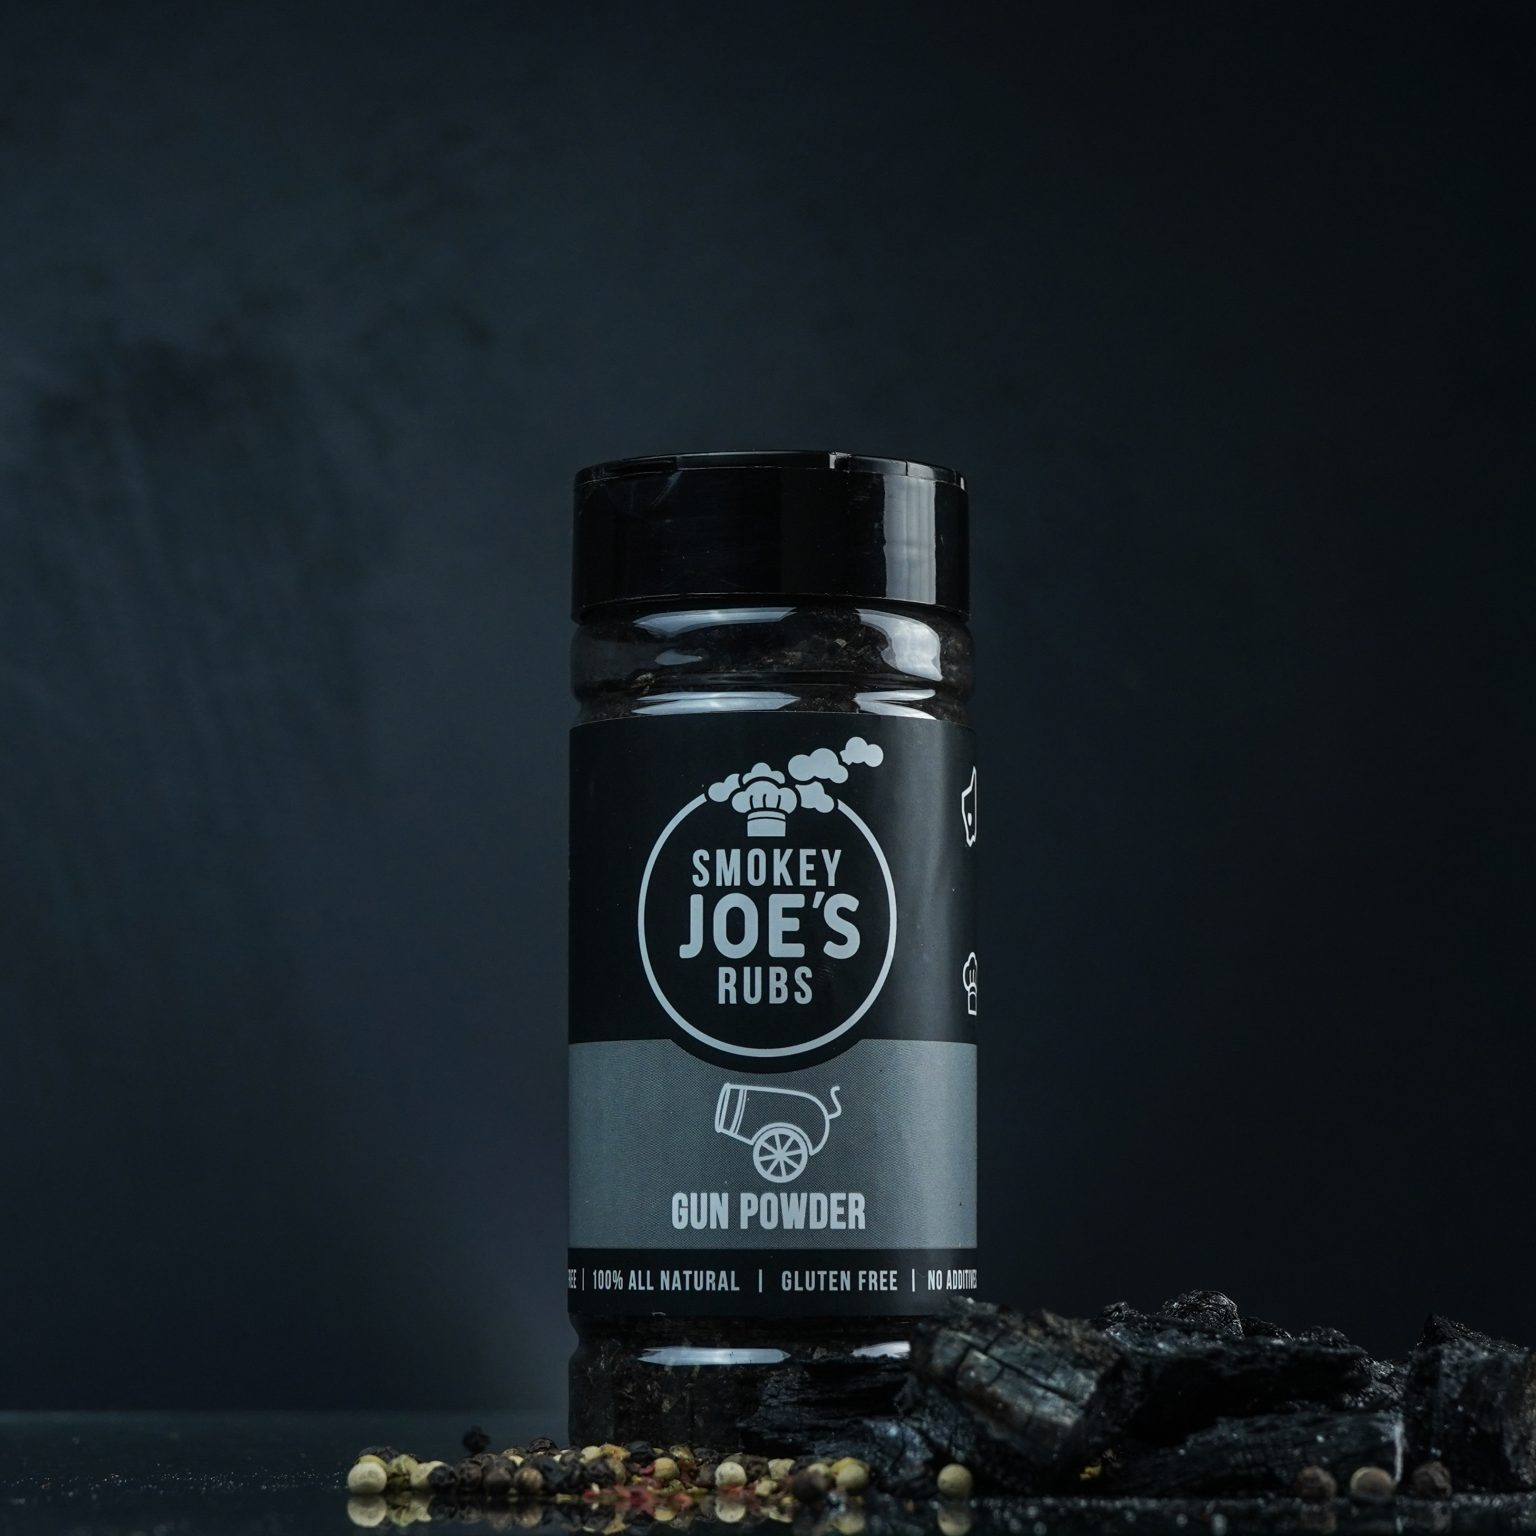 Smokey Joes Gunpowder Rub